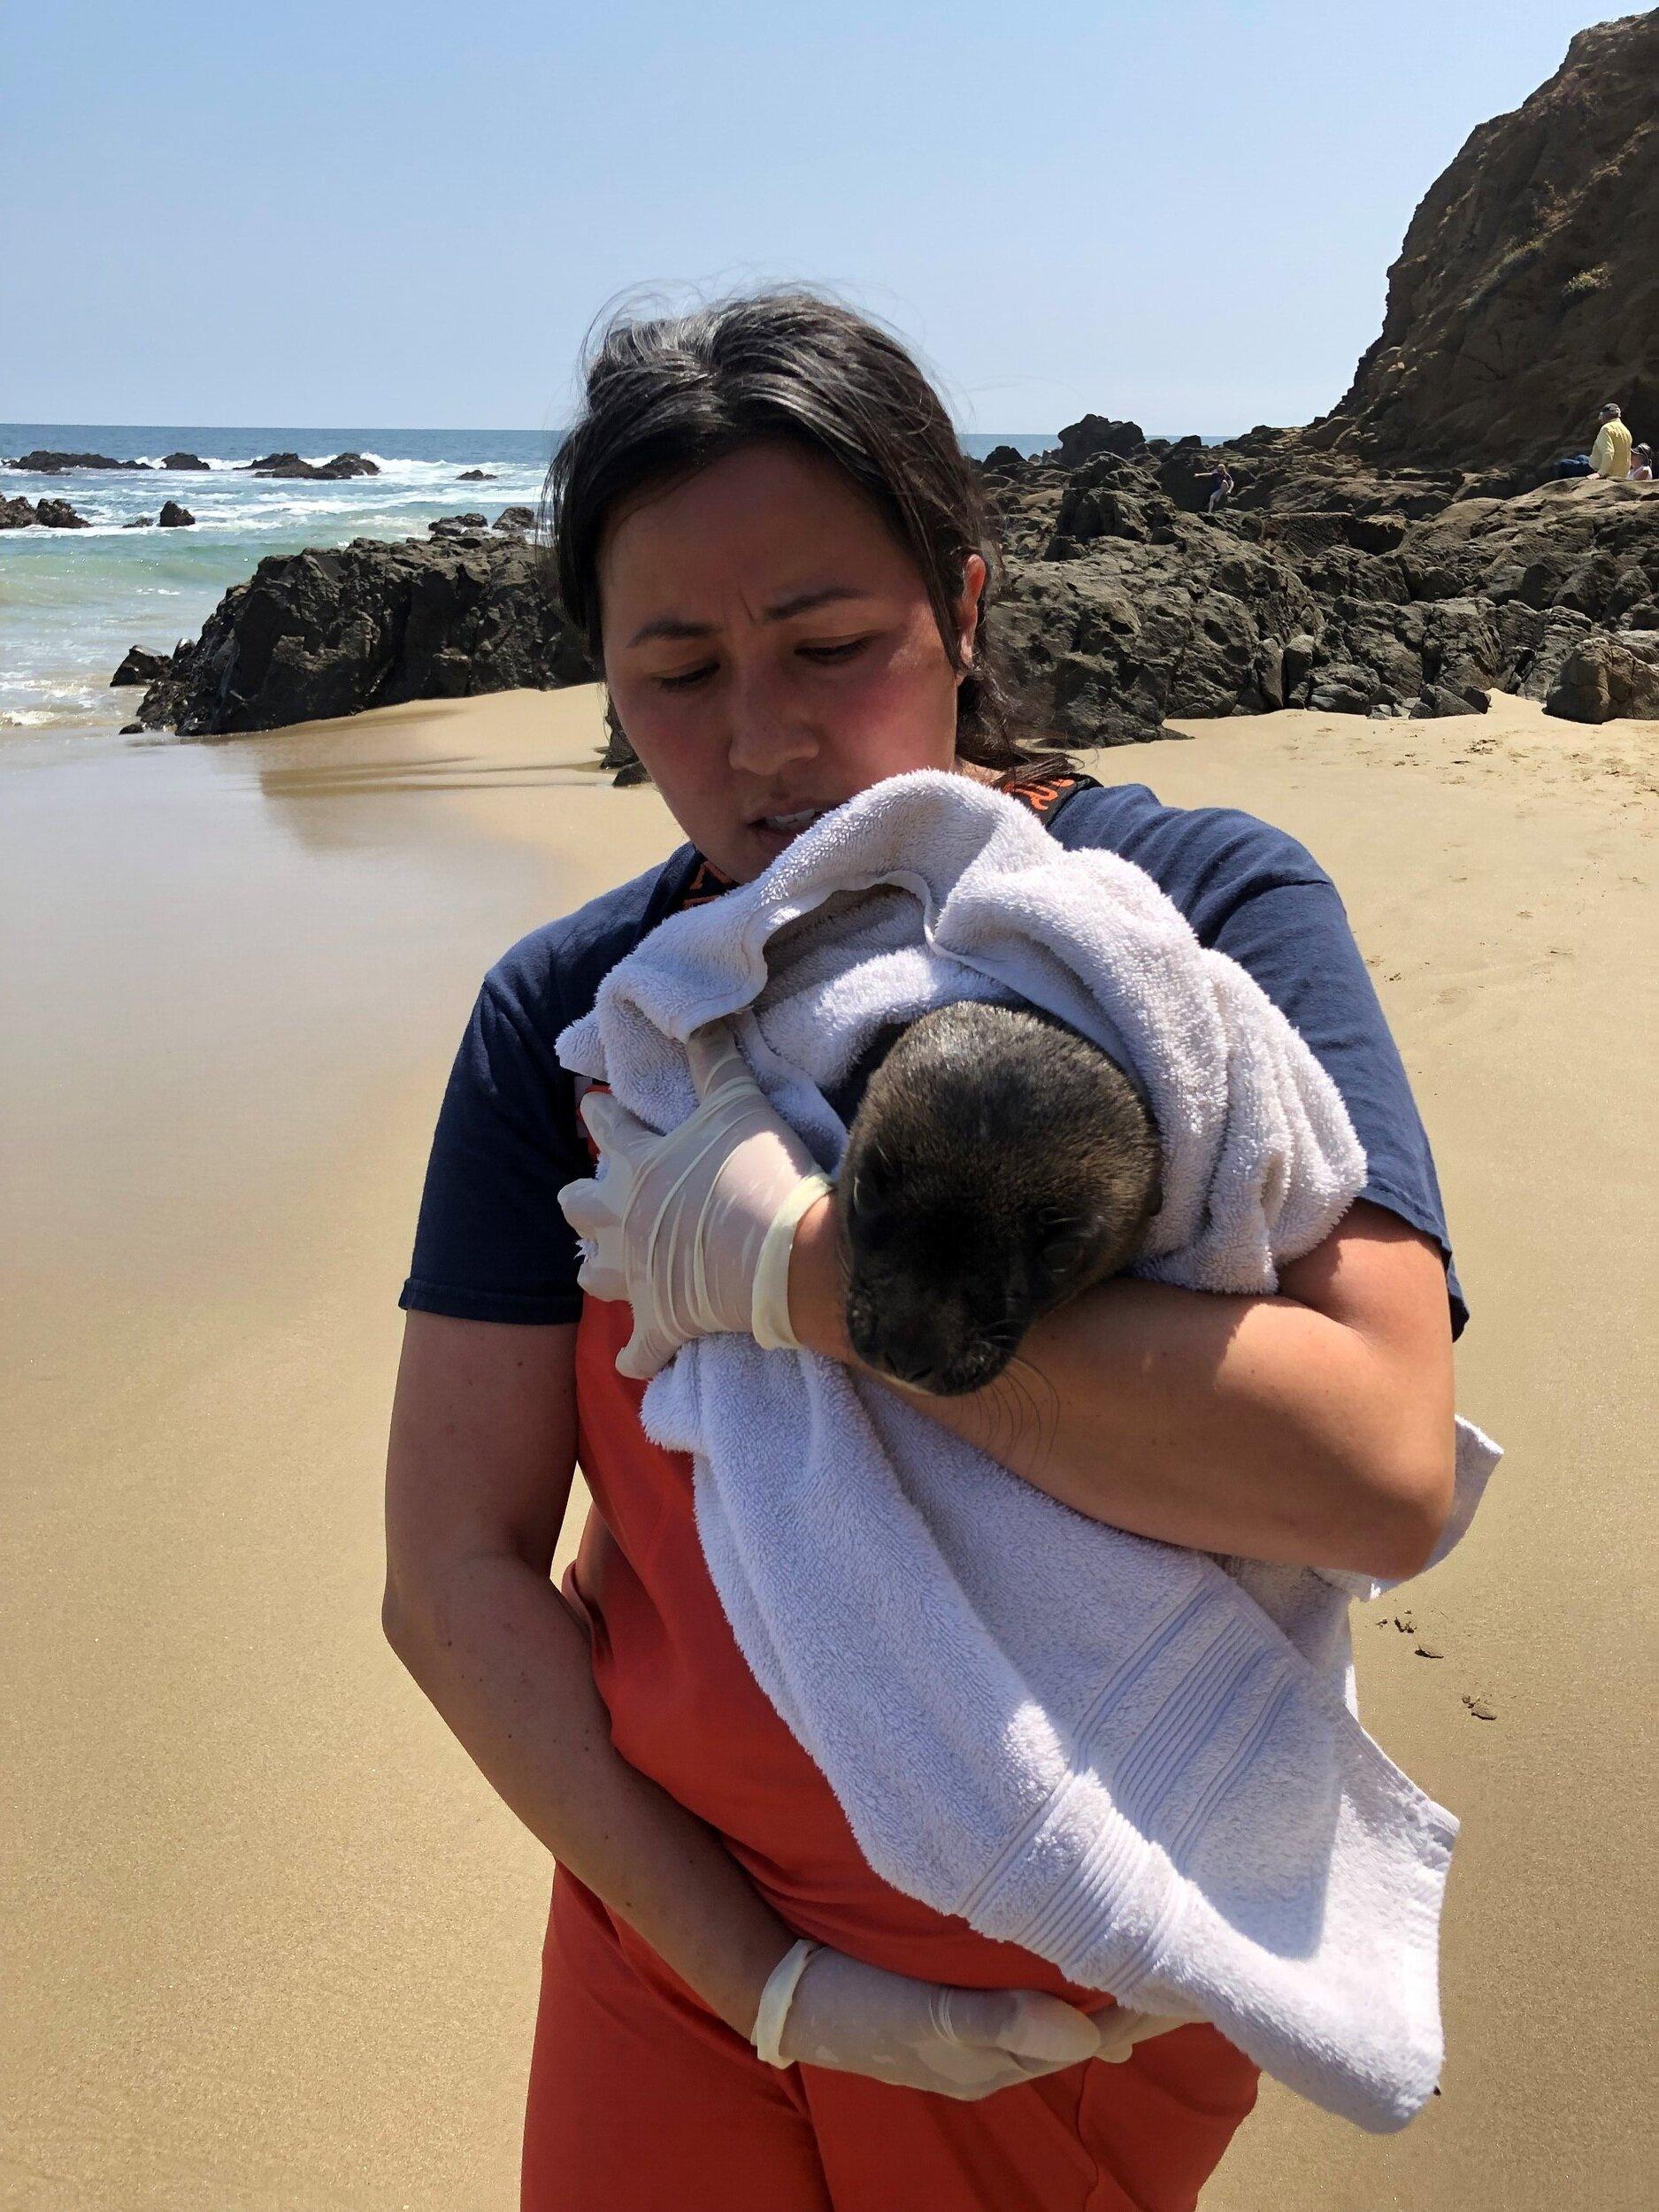 Krysta rescuing a newborn sea lion at Cresent Bay.